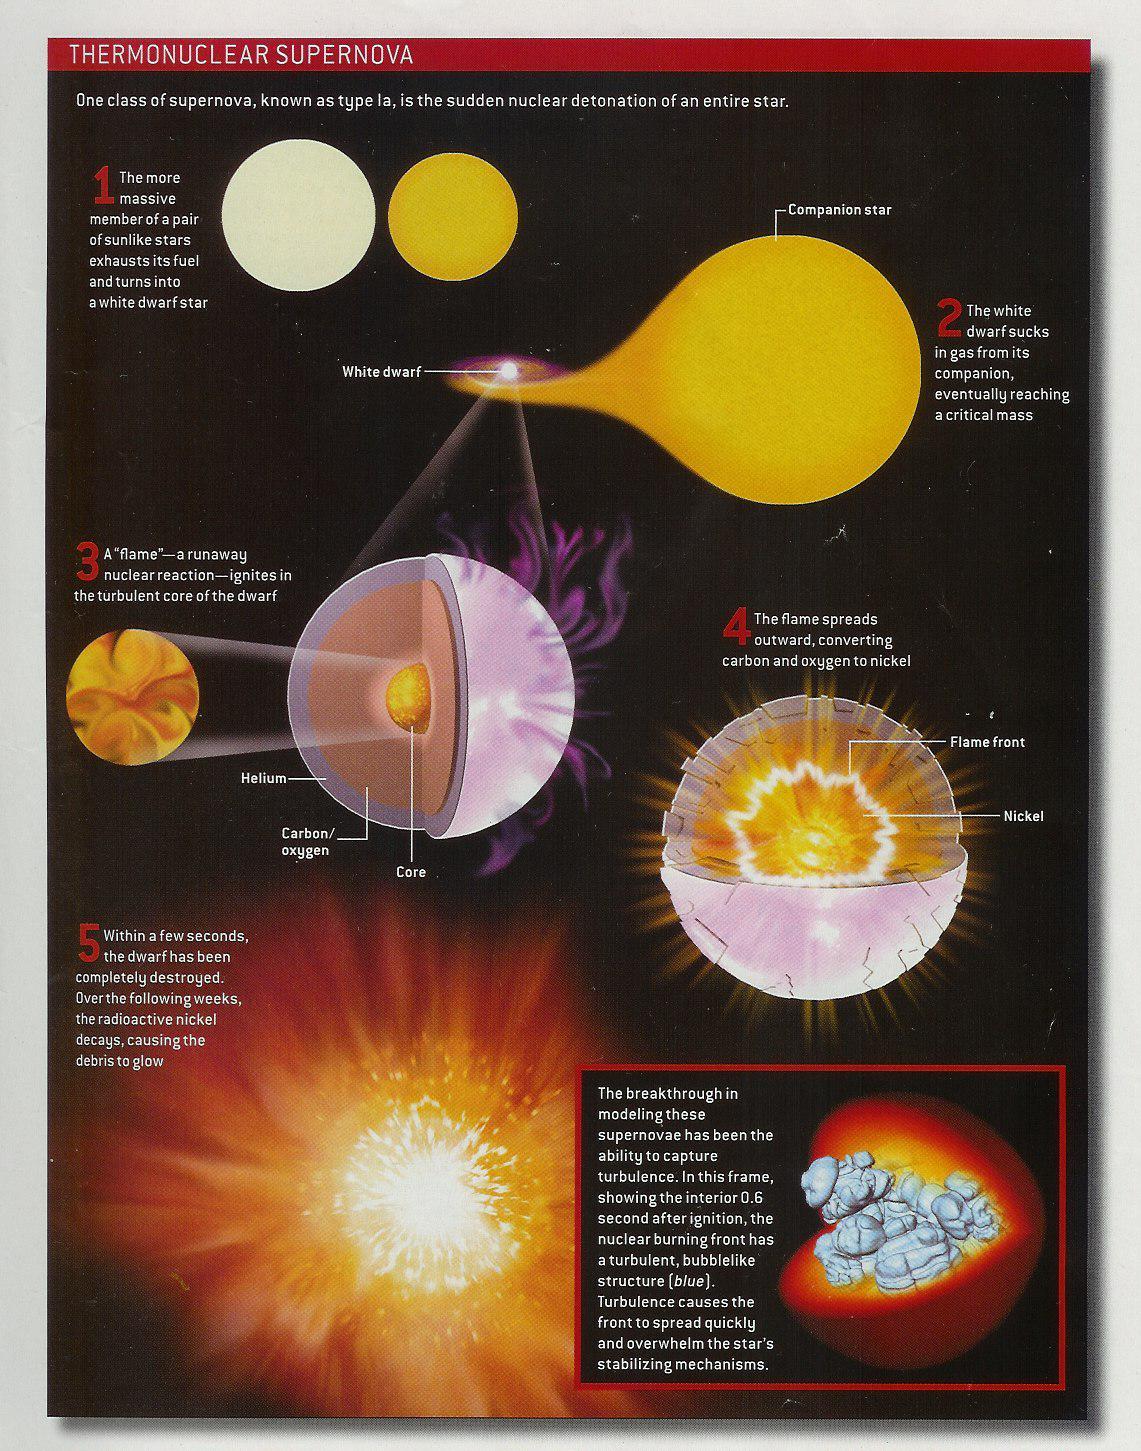 [supernova+thermonuclear]